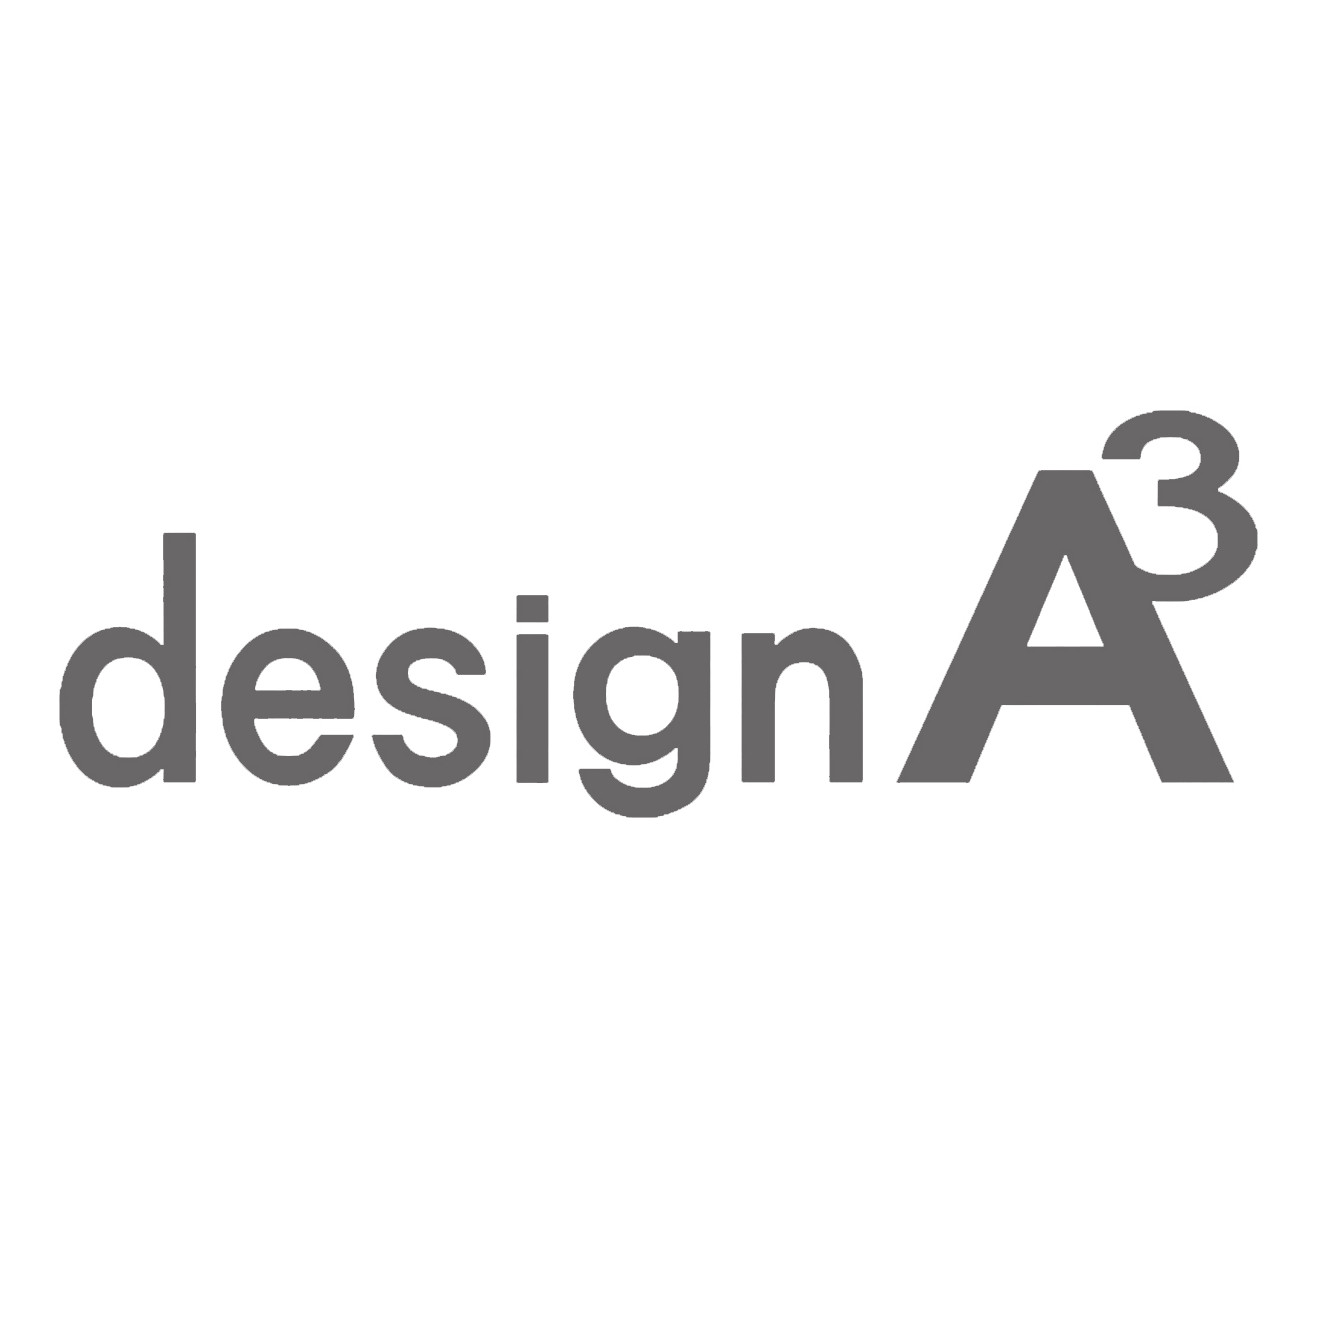 Design A3